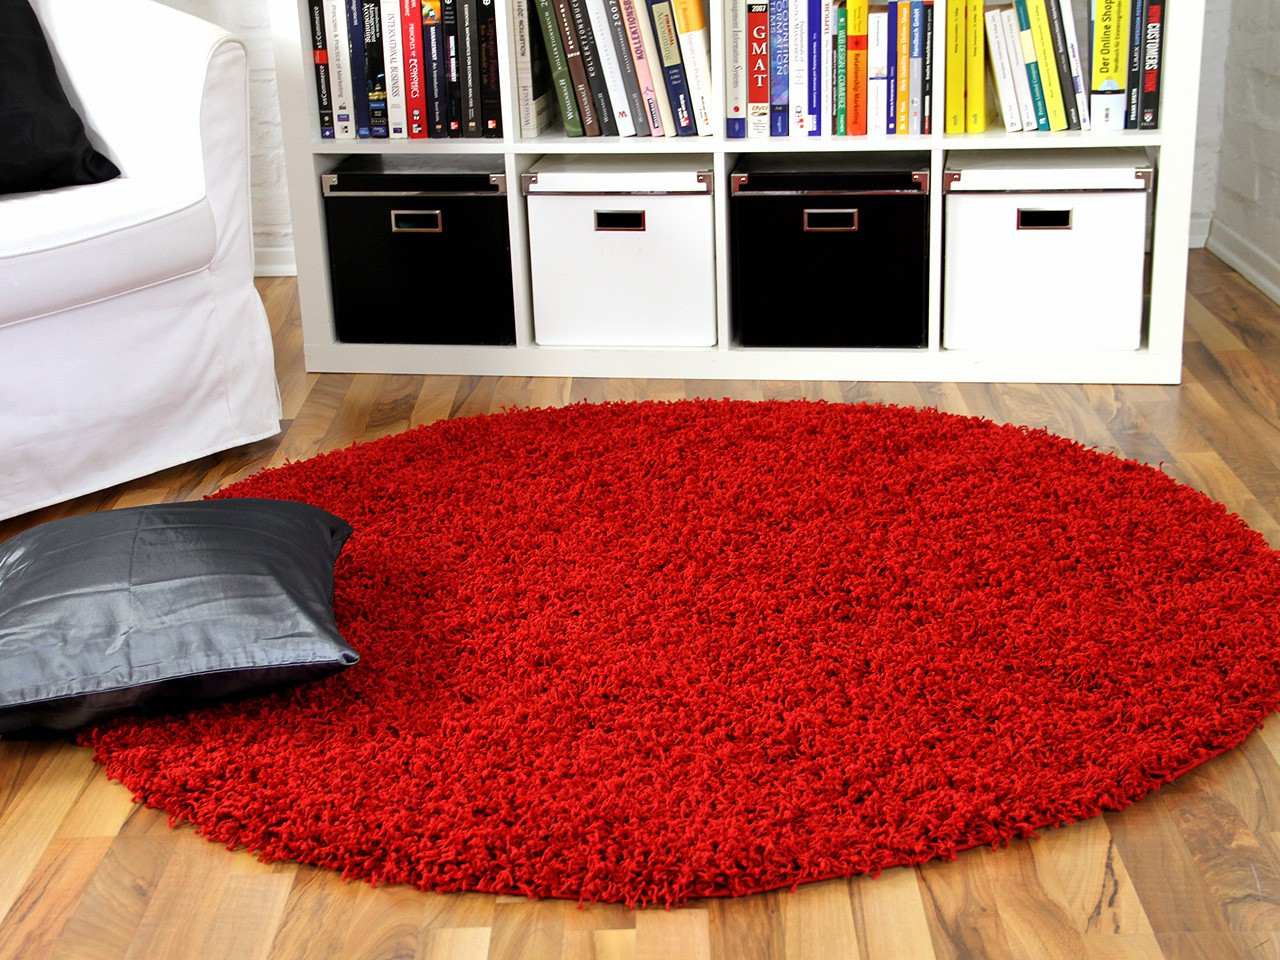 Teppich Rot  Hochflor Langflor Shaggy Teppich Aloha Rot Rund Teppiche